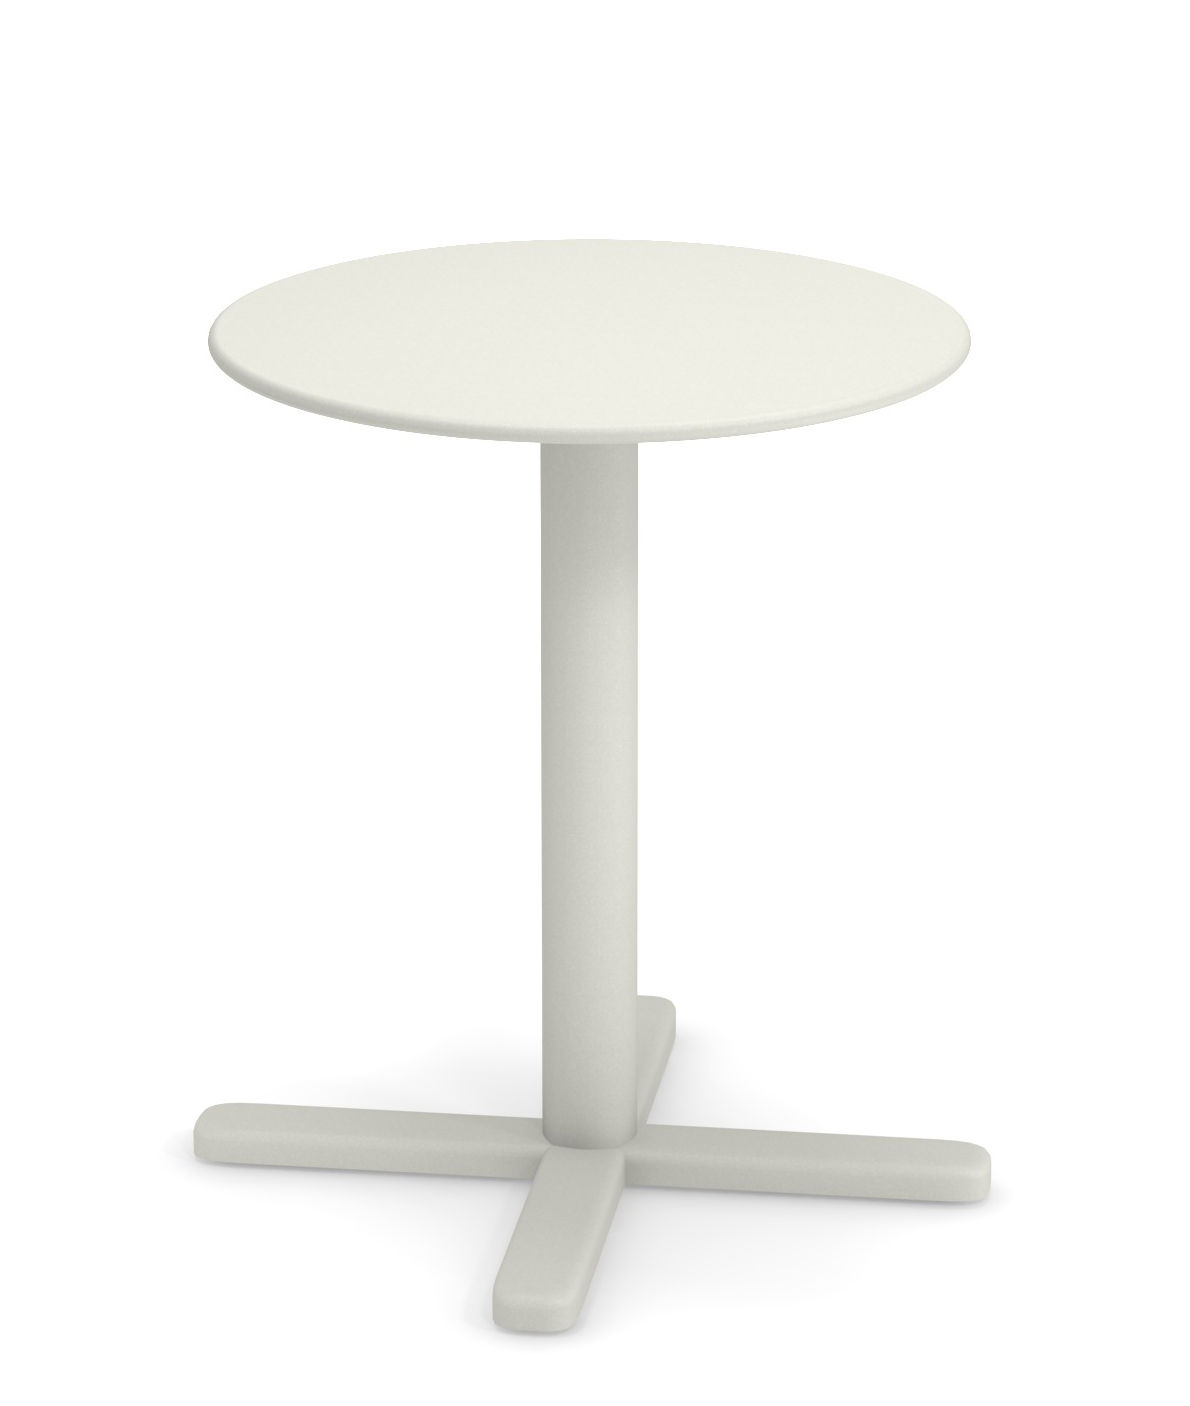 Outdoor - Tables de jardin - Table pliante Darwin / Ø 60 cm - Emu - Blanc - Acier verni